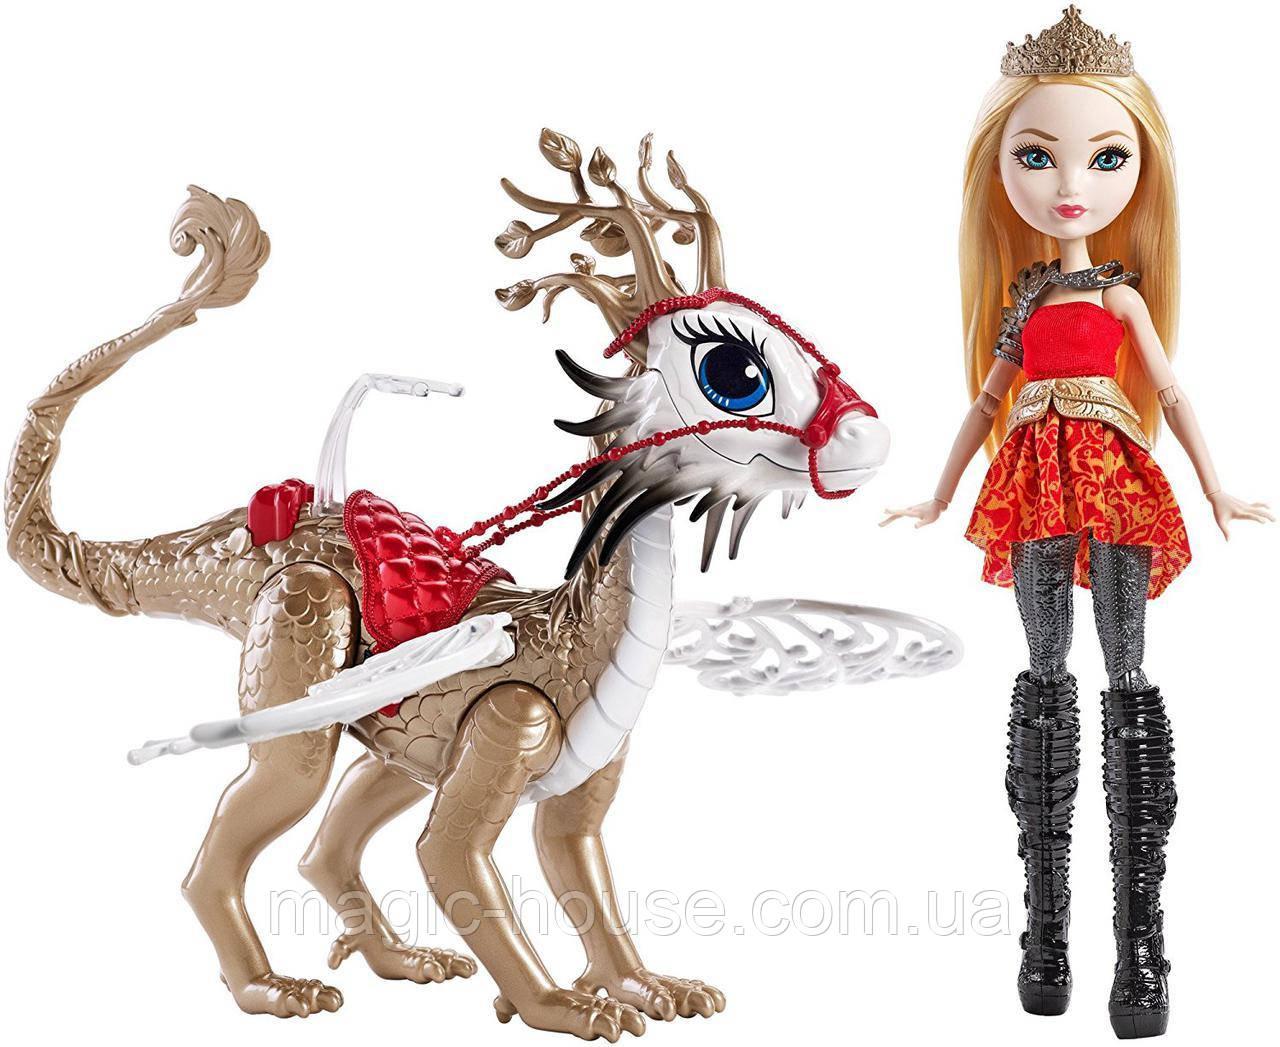 Набор Ever After High Эппл Уайт и дракон Брэбёрн Dragon Games Apple White Doll and Braebyrn Dragon